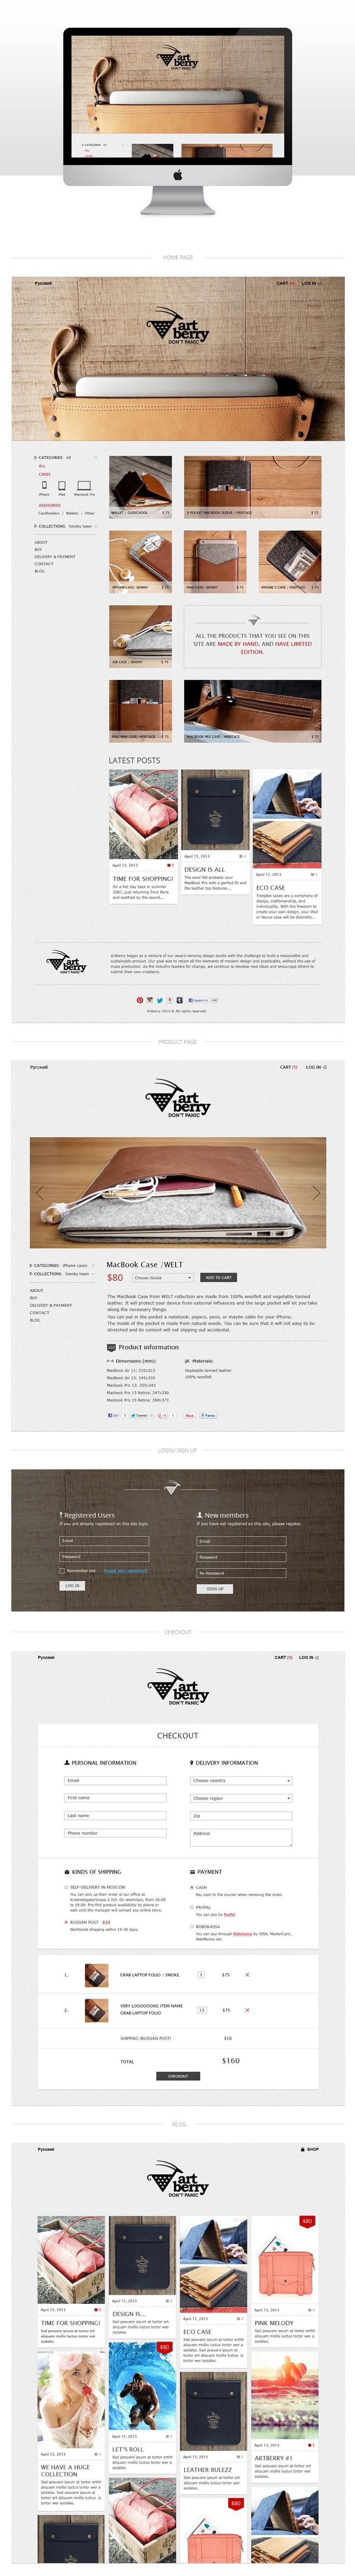 E-commerce design for Artberry by eugenee.web